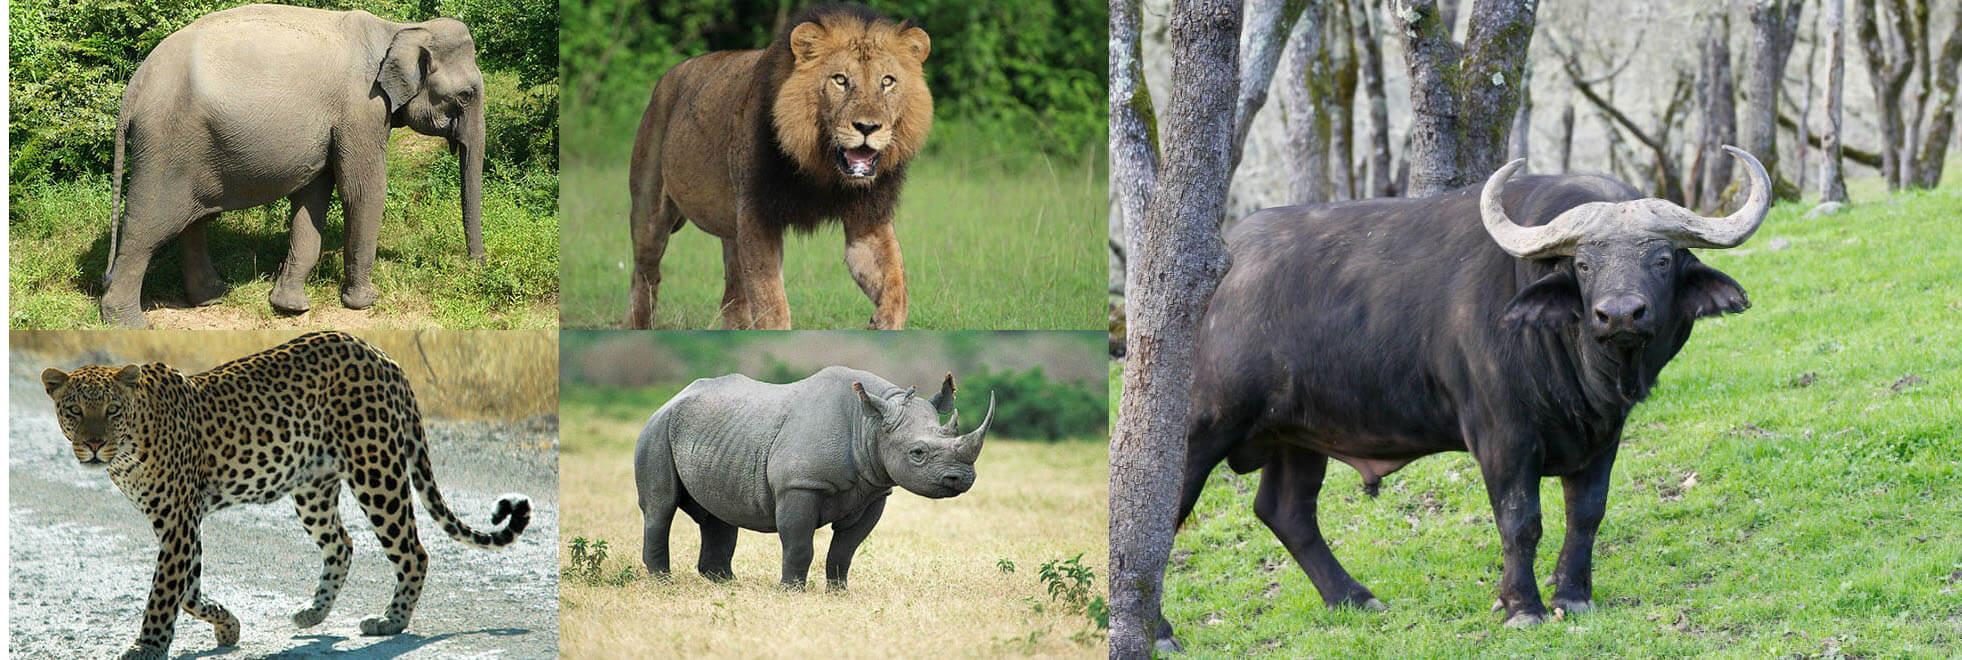 Serengeti National Park Big 5